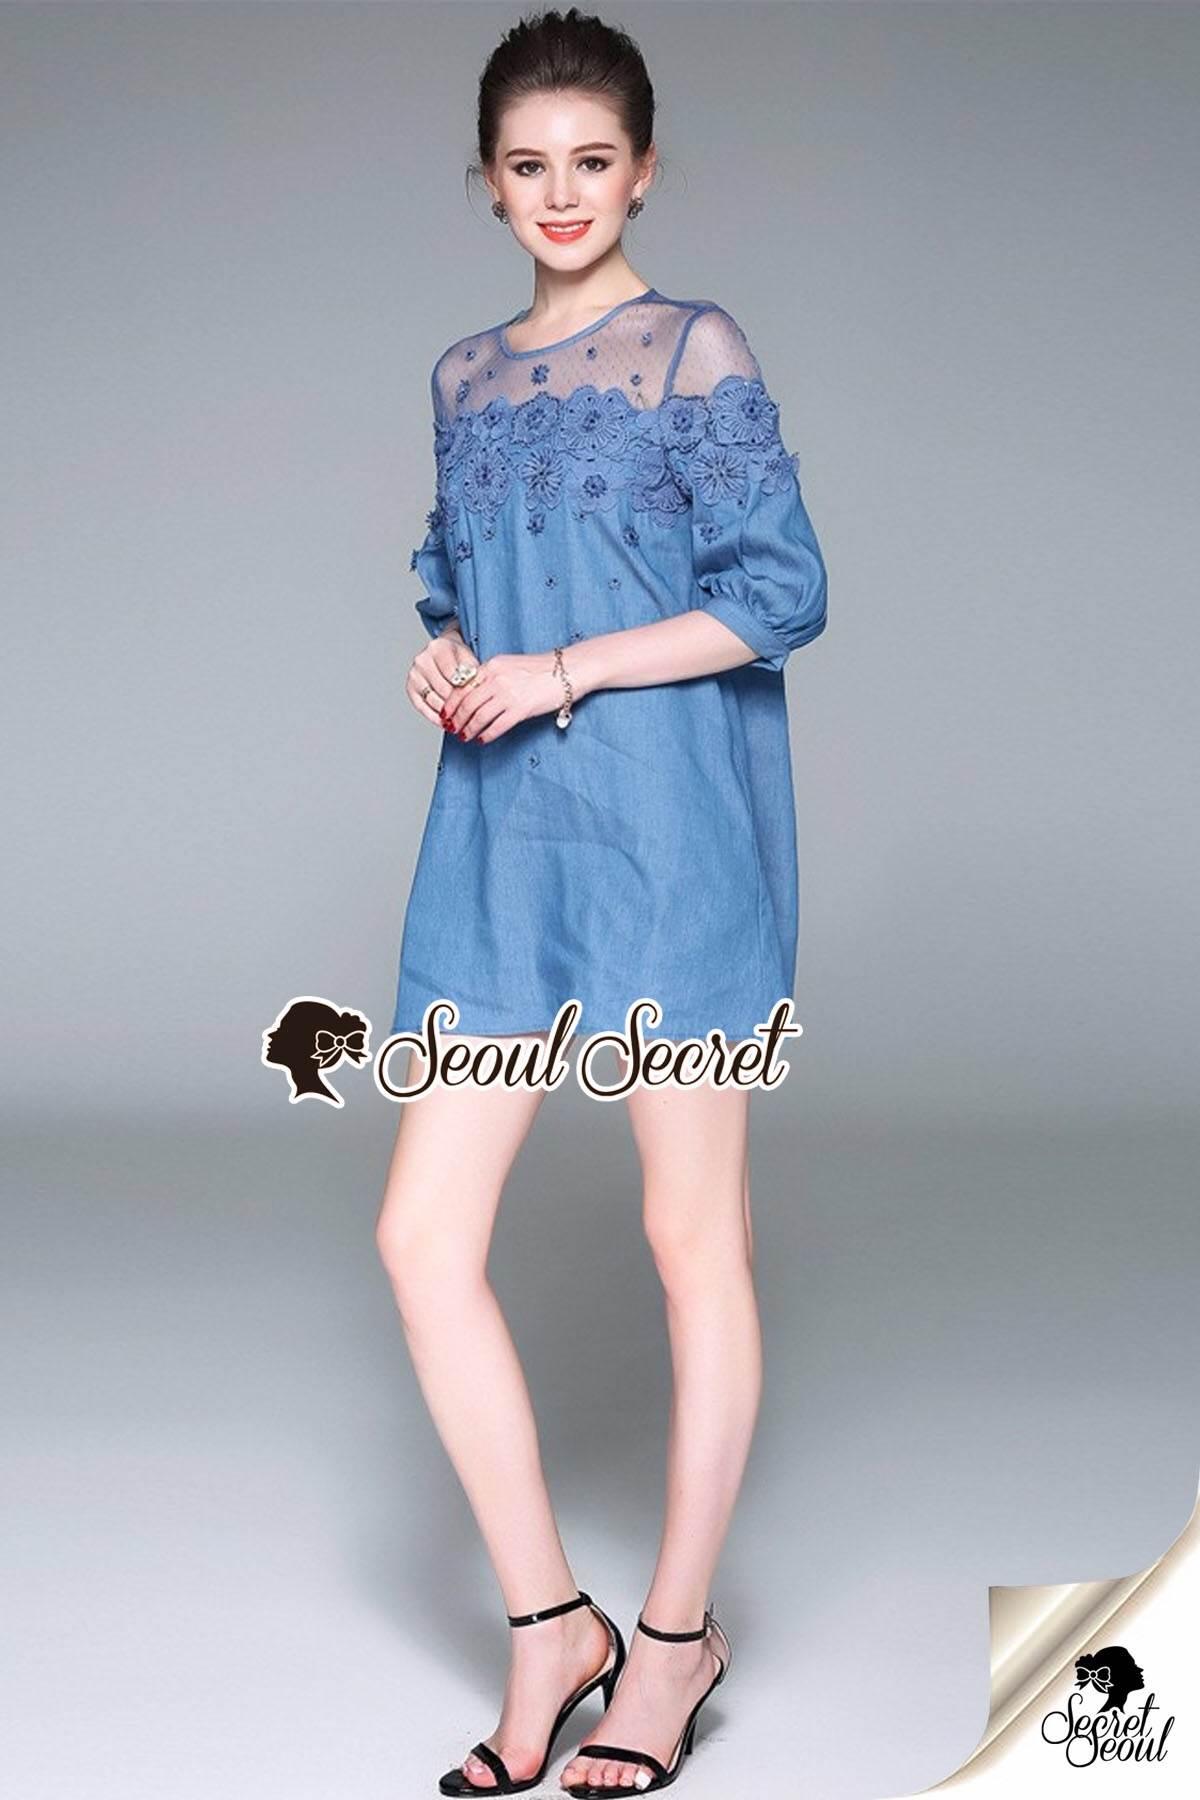 Seoul Secret Say's... Chill Mesh Fabric Lace Dress